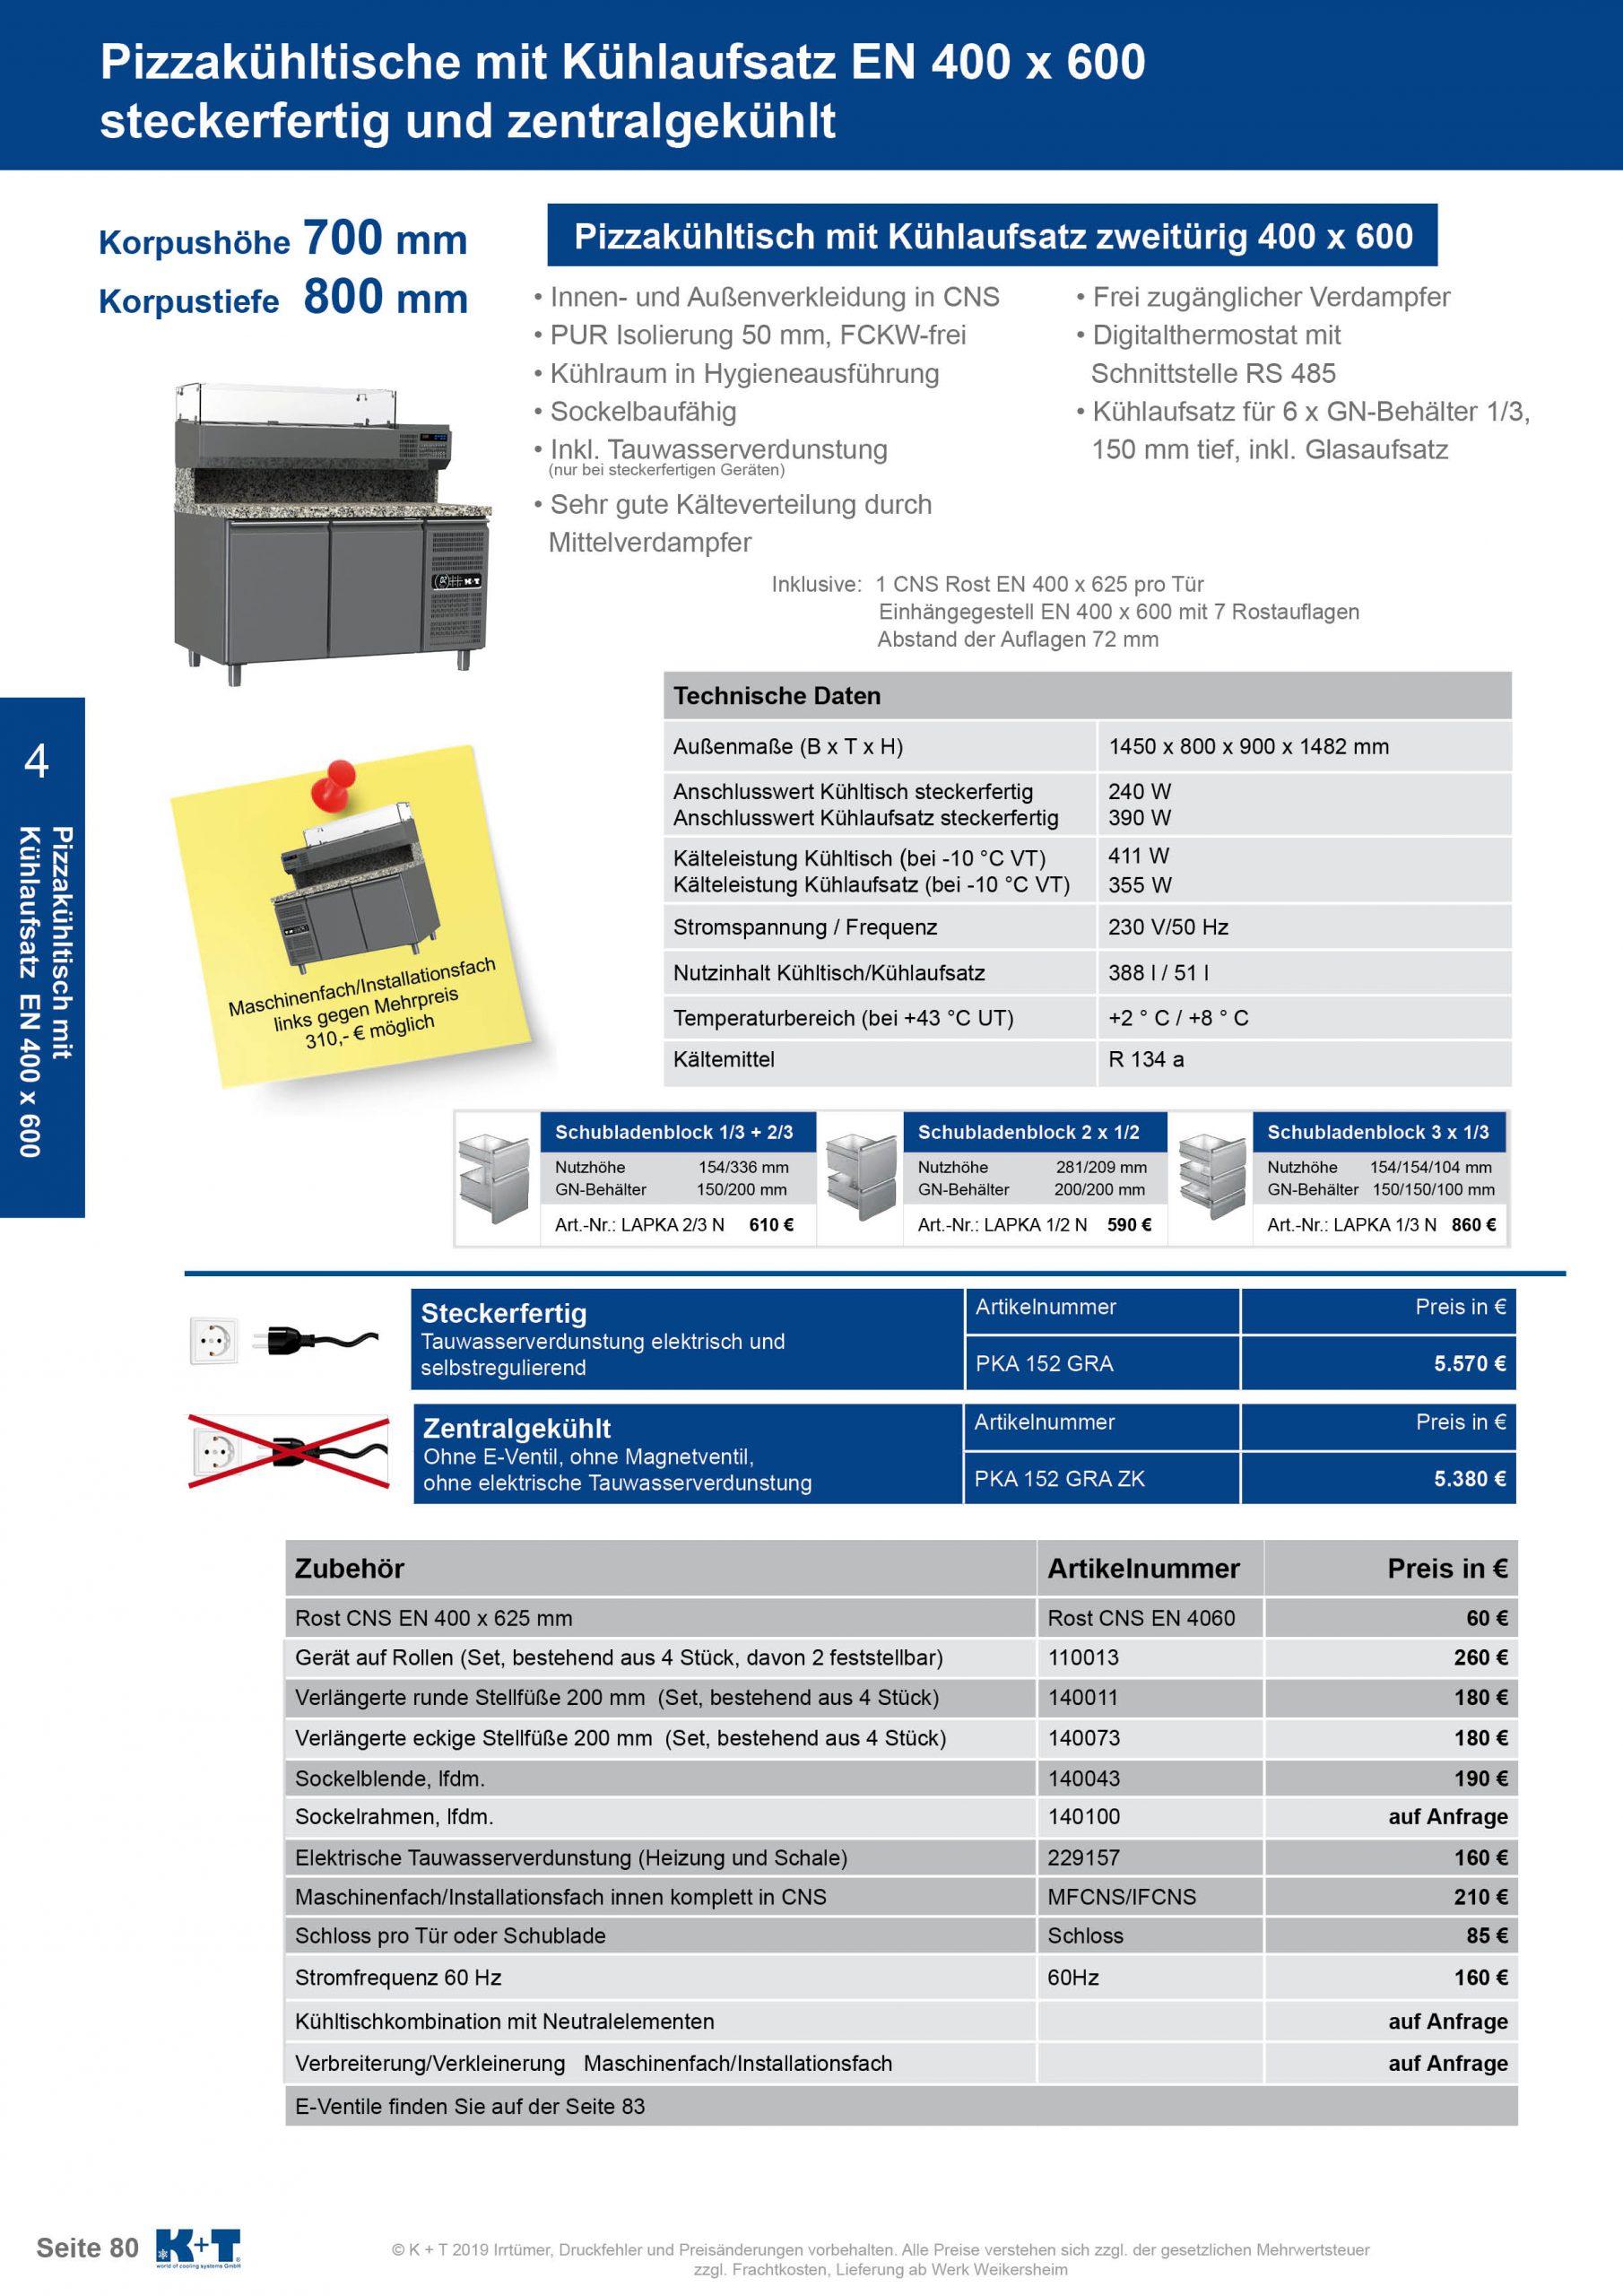 Pizzakühltisch Euronorm 400 x 600 Korpushöhe 700, Tiefe 800 steckerfertig 1